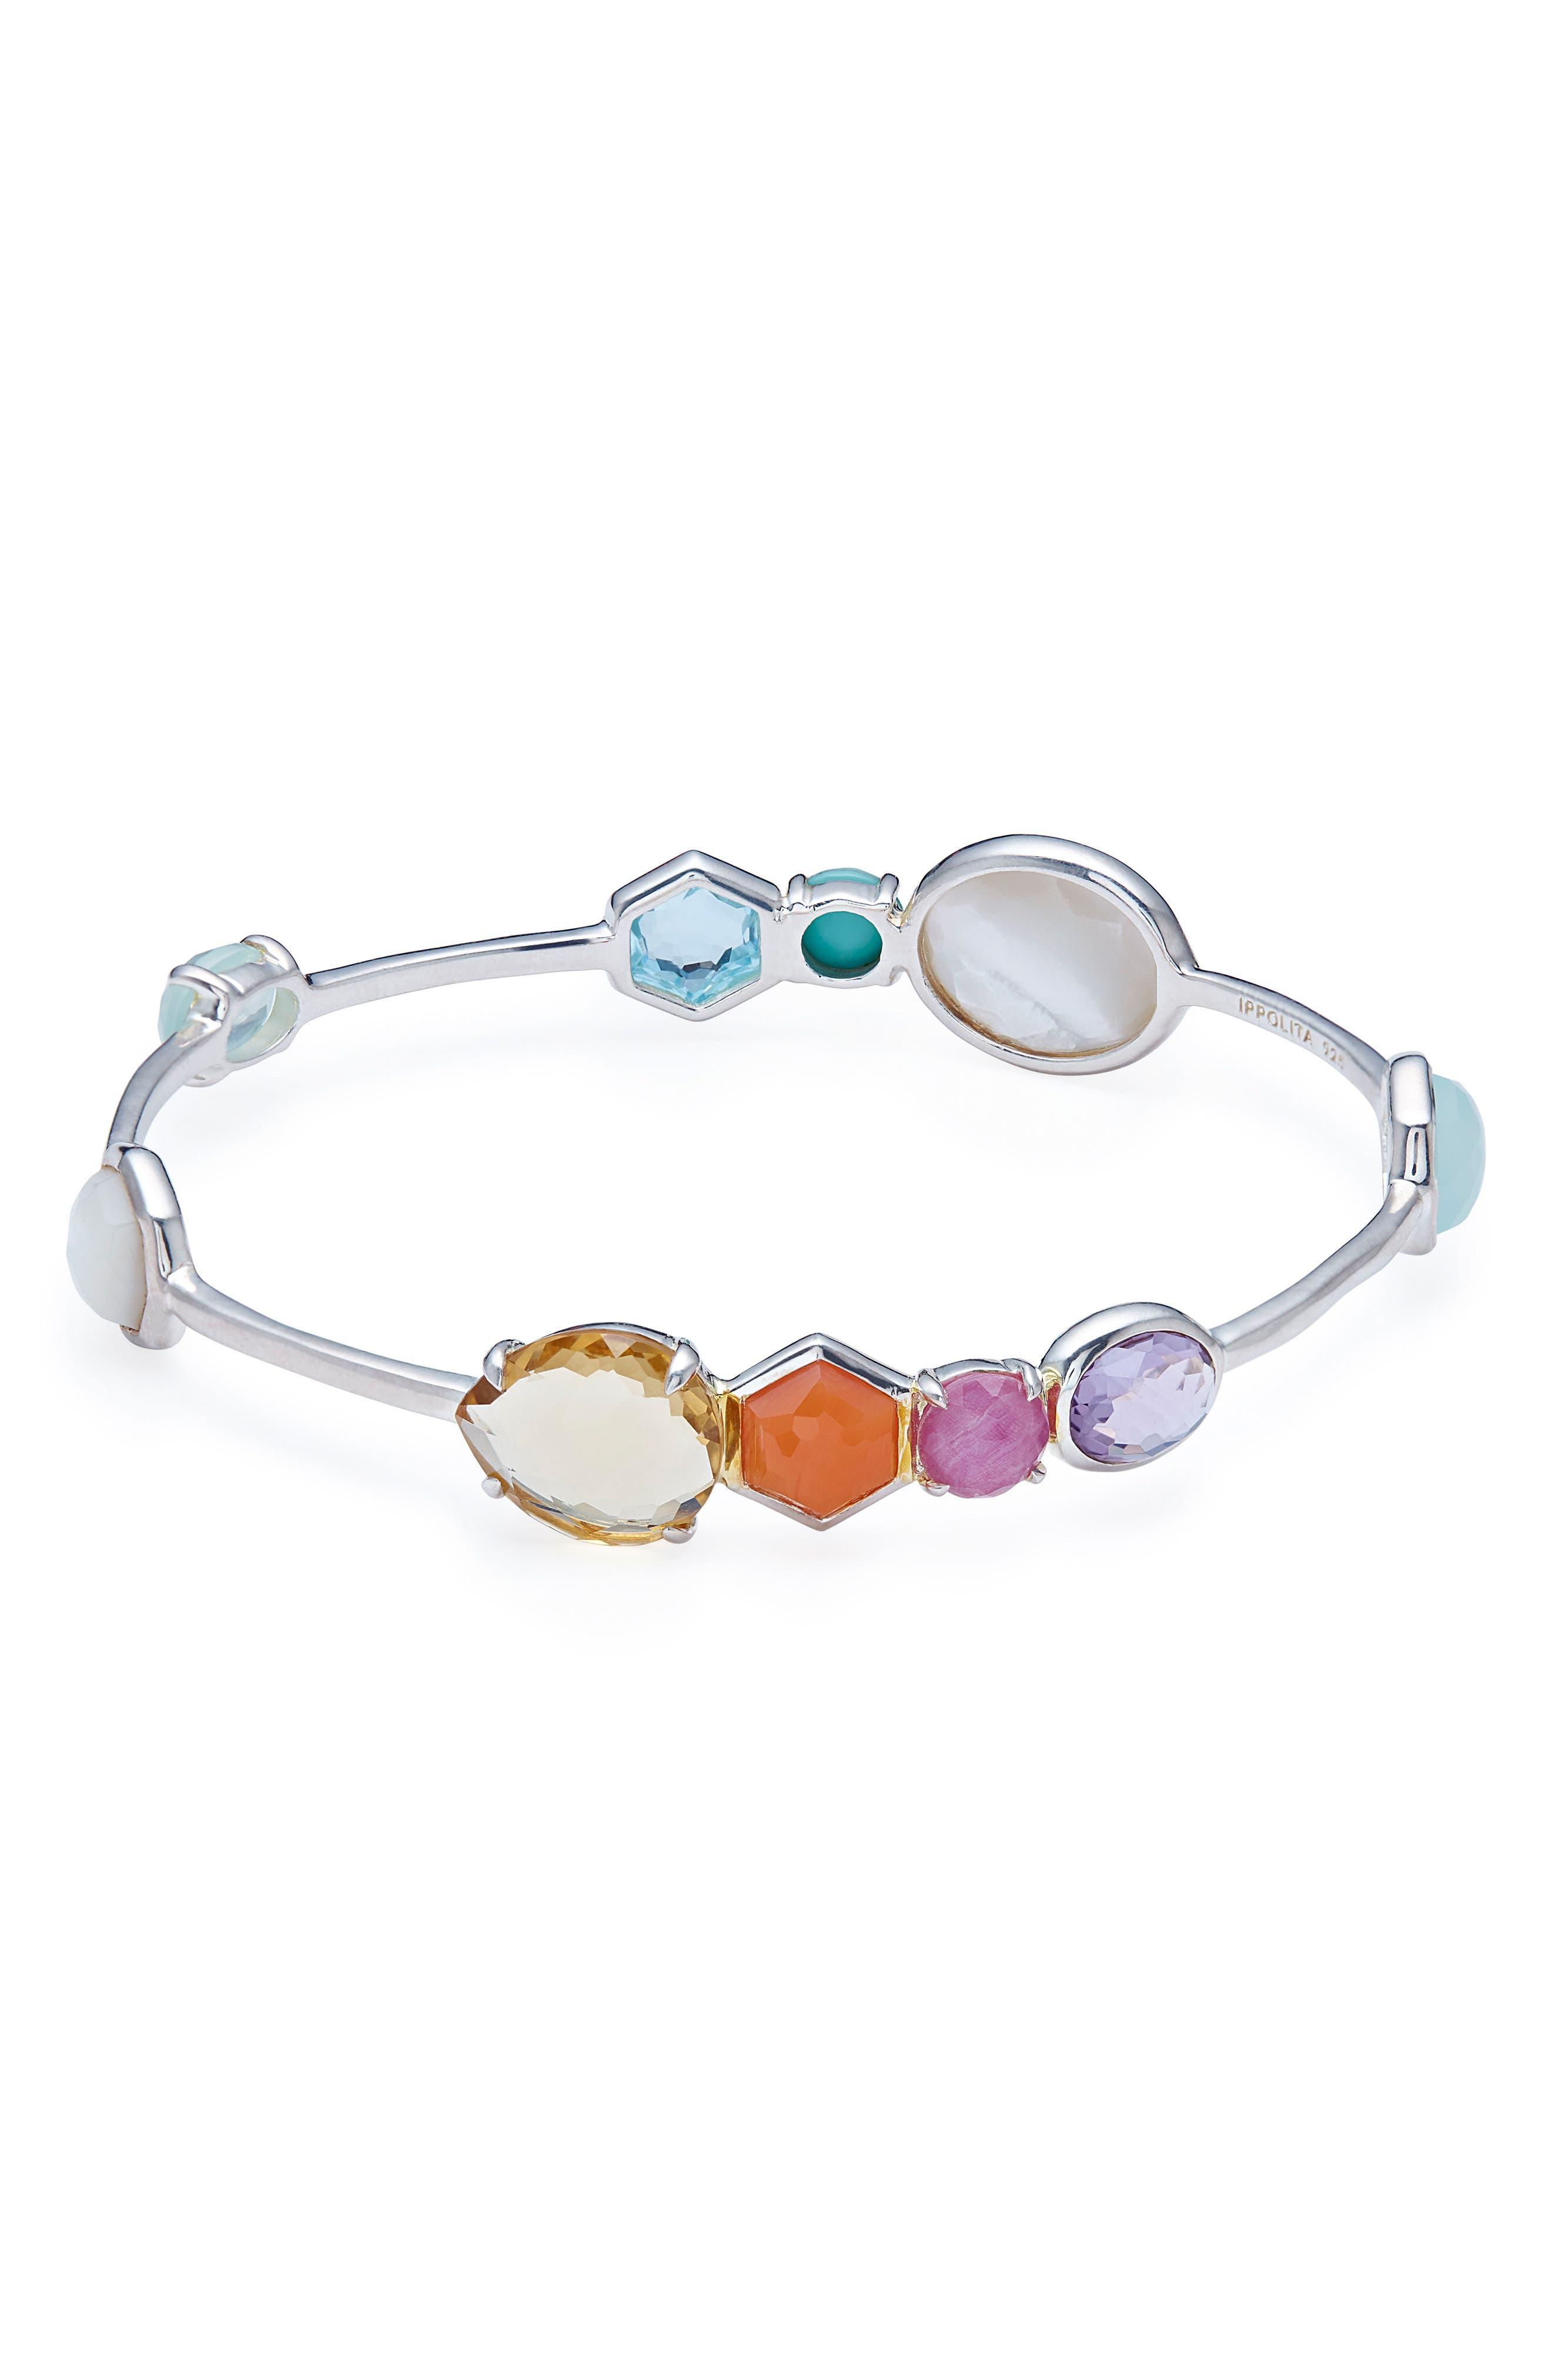 925 Rock Candy Station Bracelet In Harmony in Rainbow